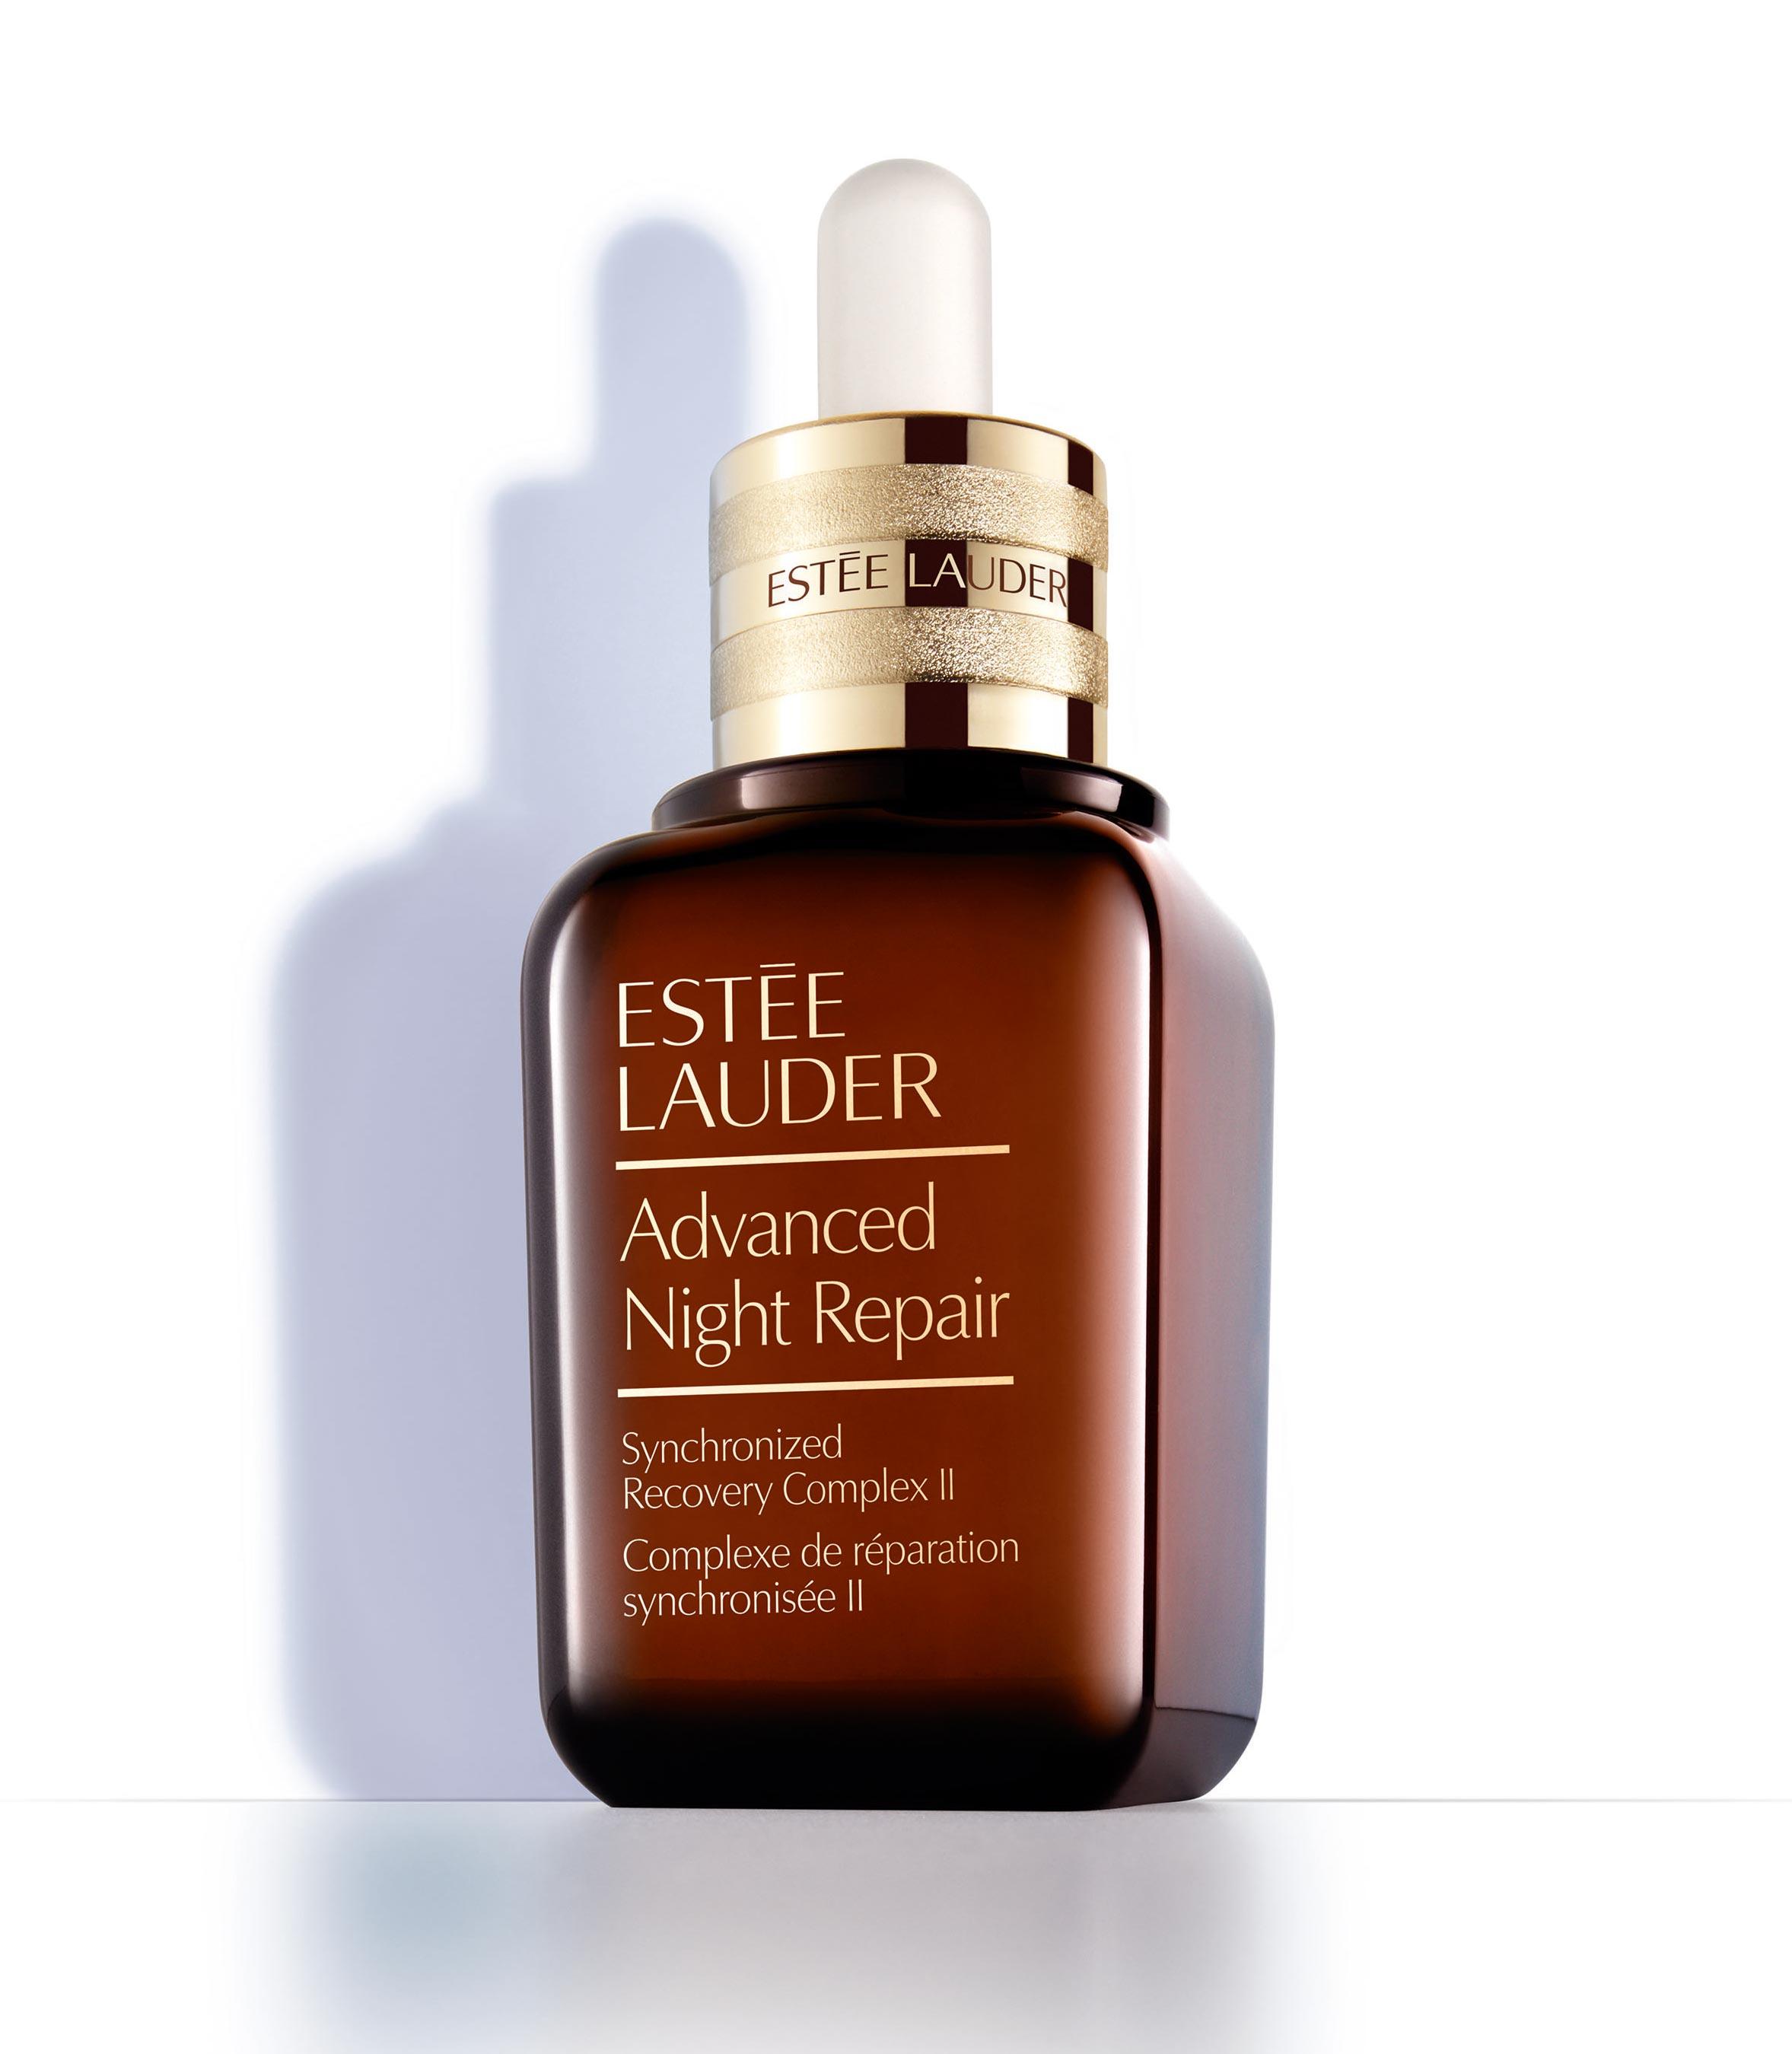 Estee-Lauder-Advanced-Night-Repair-Synchronized-Recovery-Complex-II-